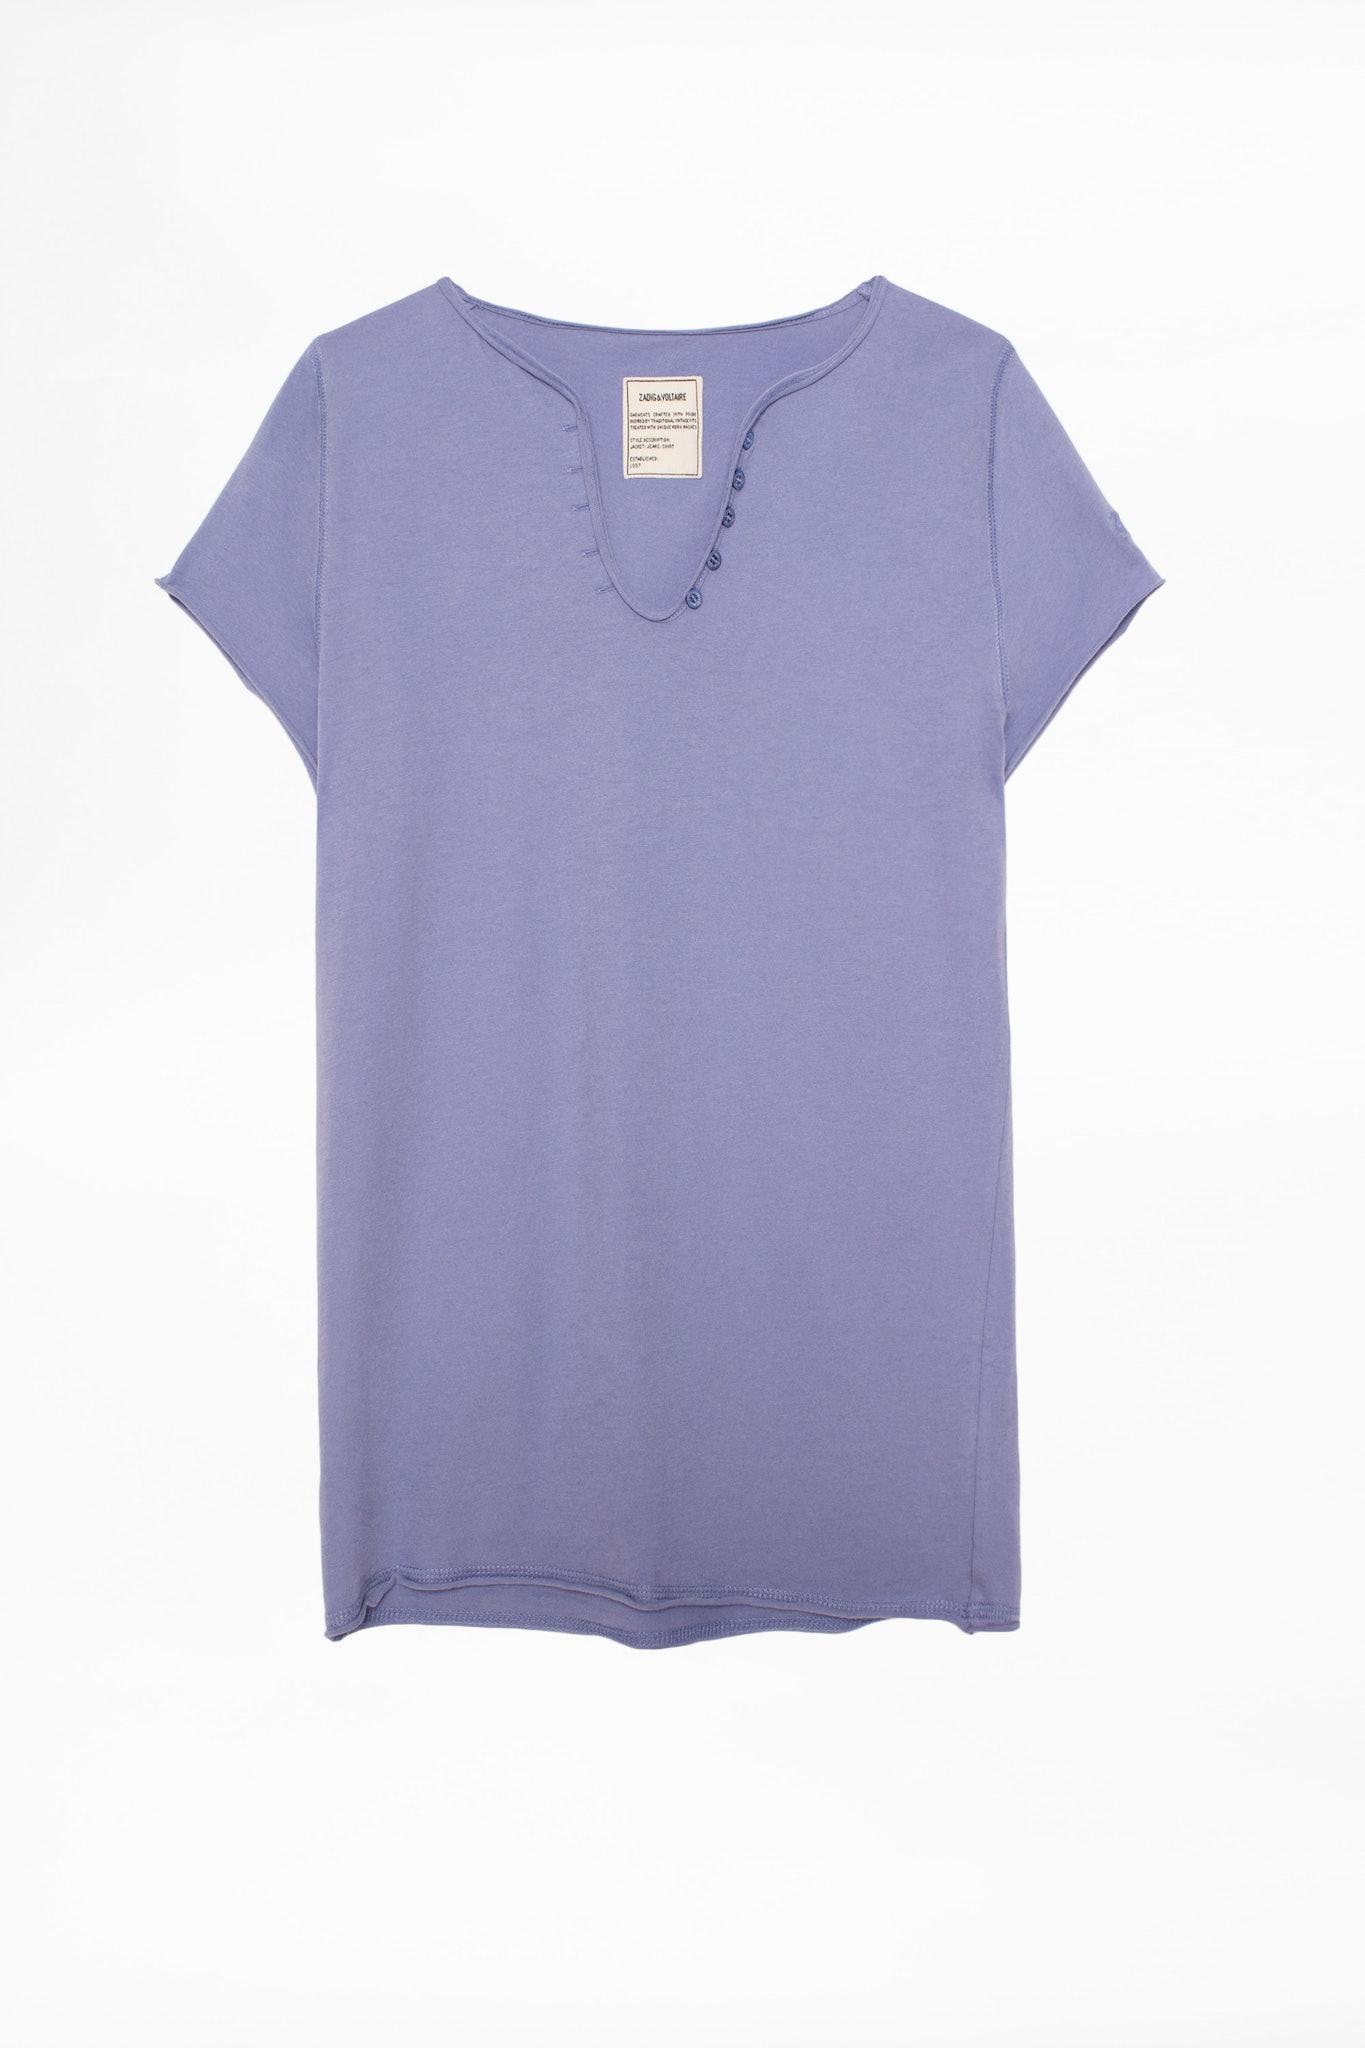 Camiseta Cuello Panadero Tunys Slub Colorama